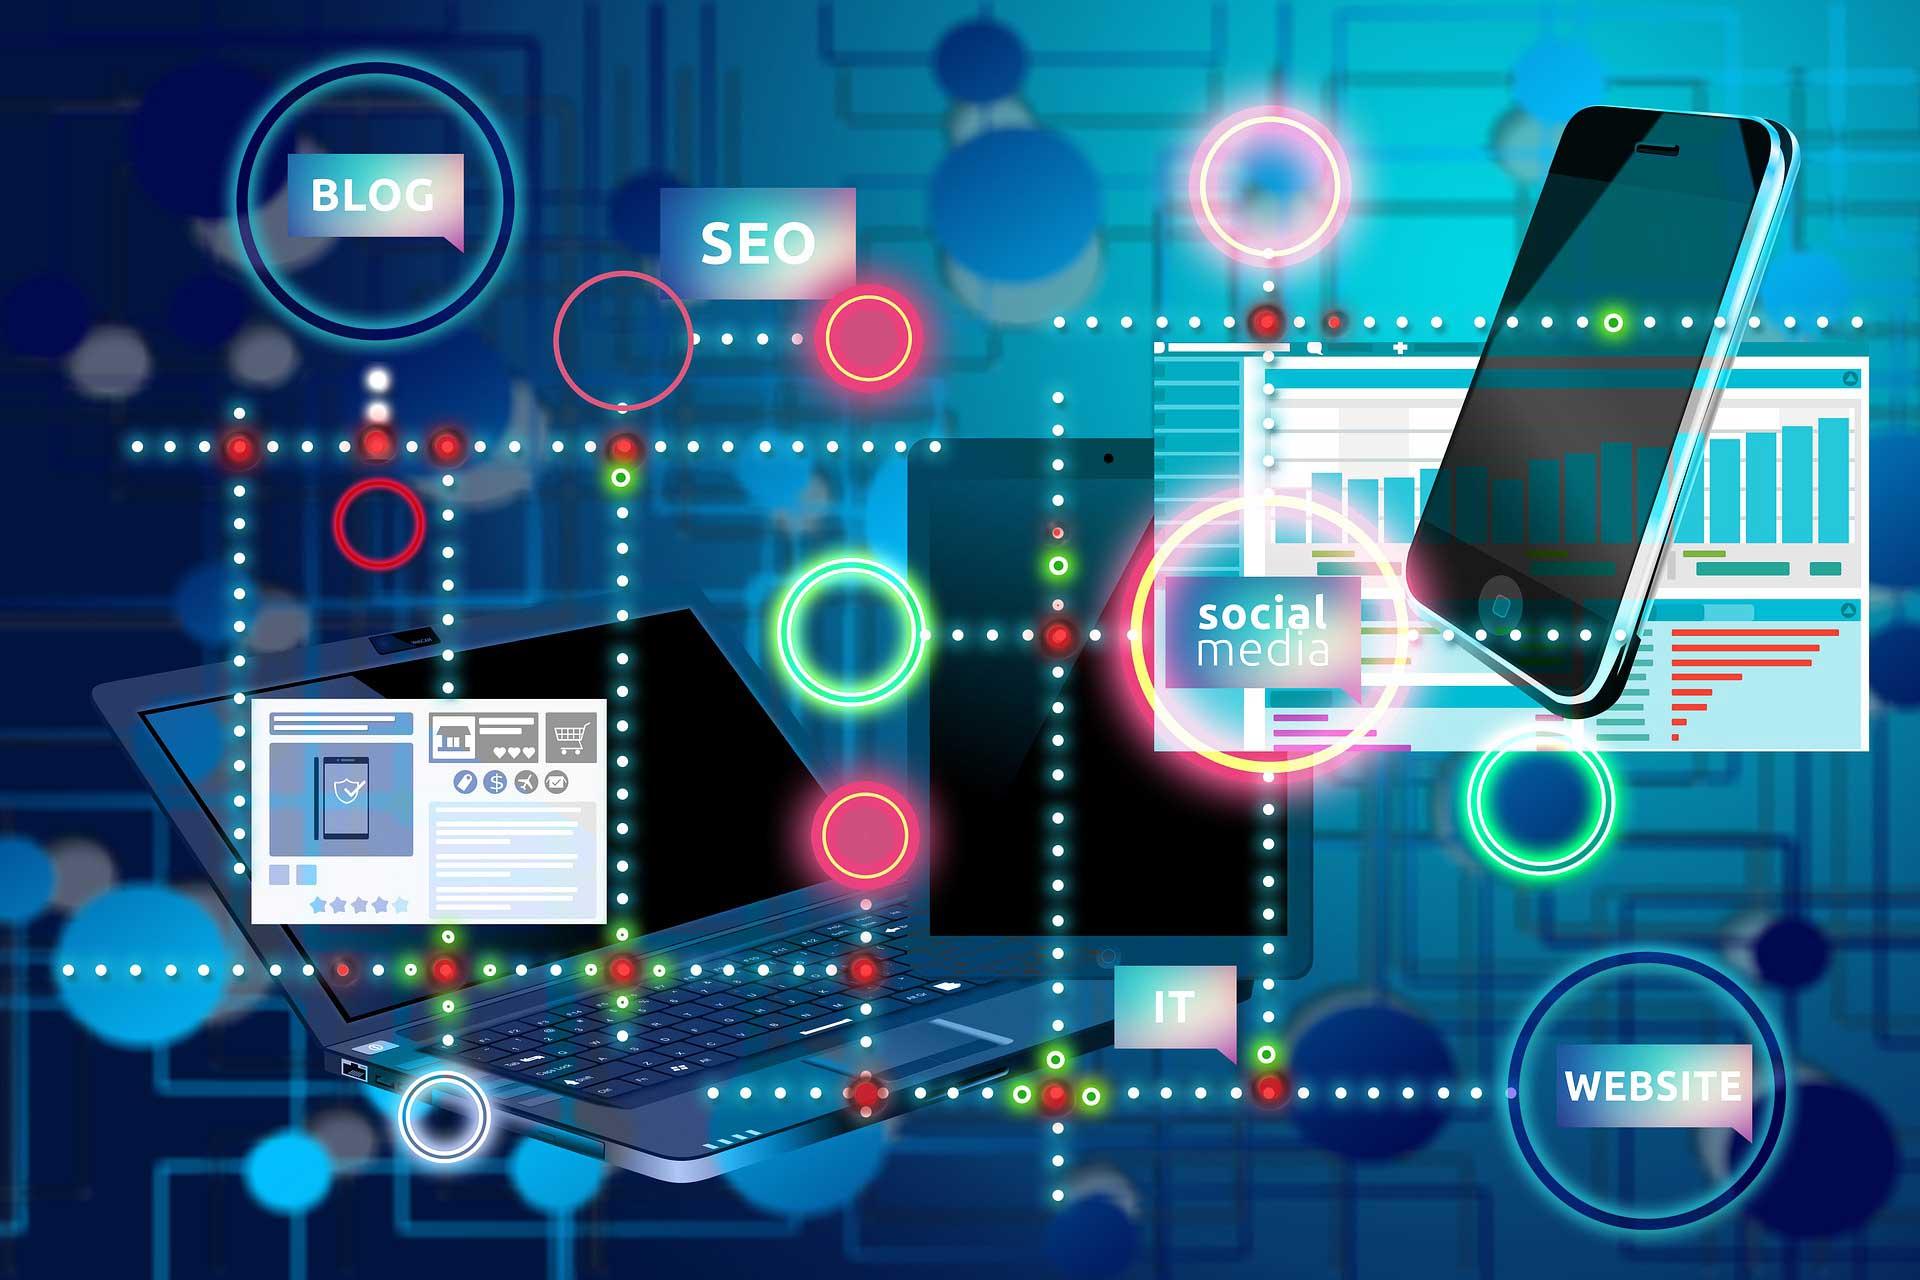 digital-marketing-strategy-in-Bangladesh-Acquaint-Technologies-Bangladesh